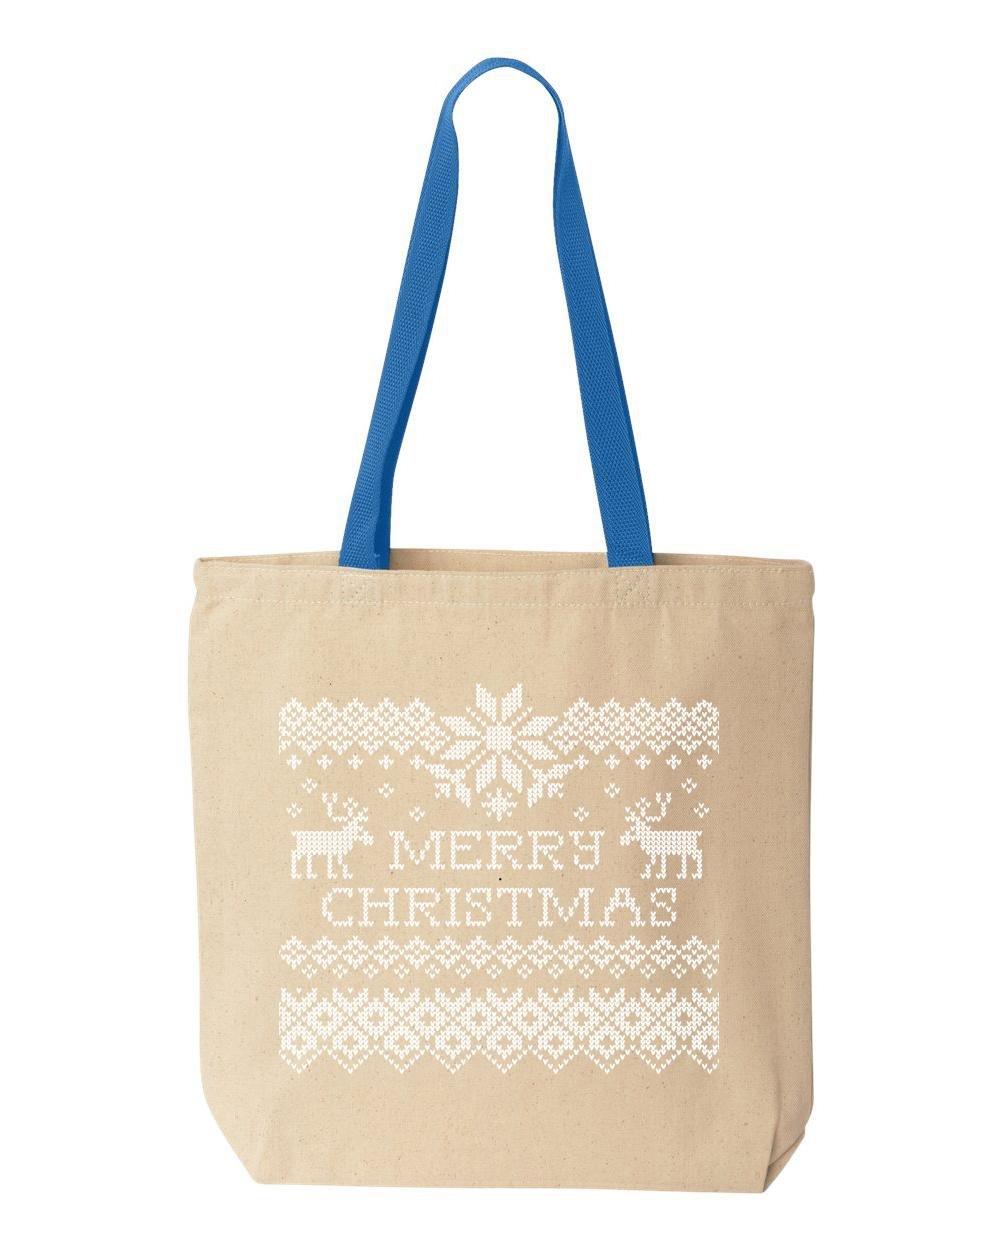 shop4ever Merry Christmasトナカイコットンキャンバストートバッグクロスステッチ再利用可能なショッピングバッグ10 oz色付きハンドル 10 oz ブルー S4E_1215_ChristRinds_TB_8868_R Blue_3 B072L2FNF9  ナチュラル-ロイヤルブルー